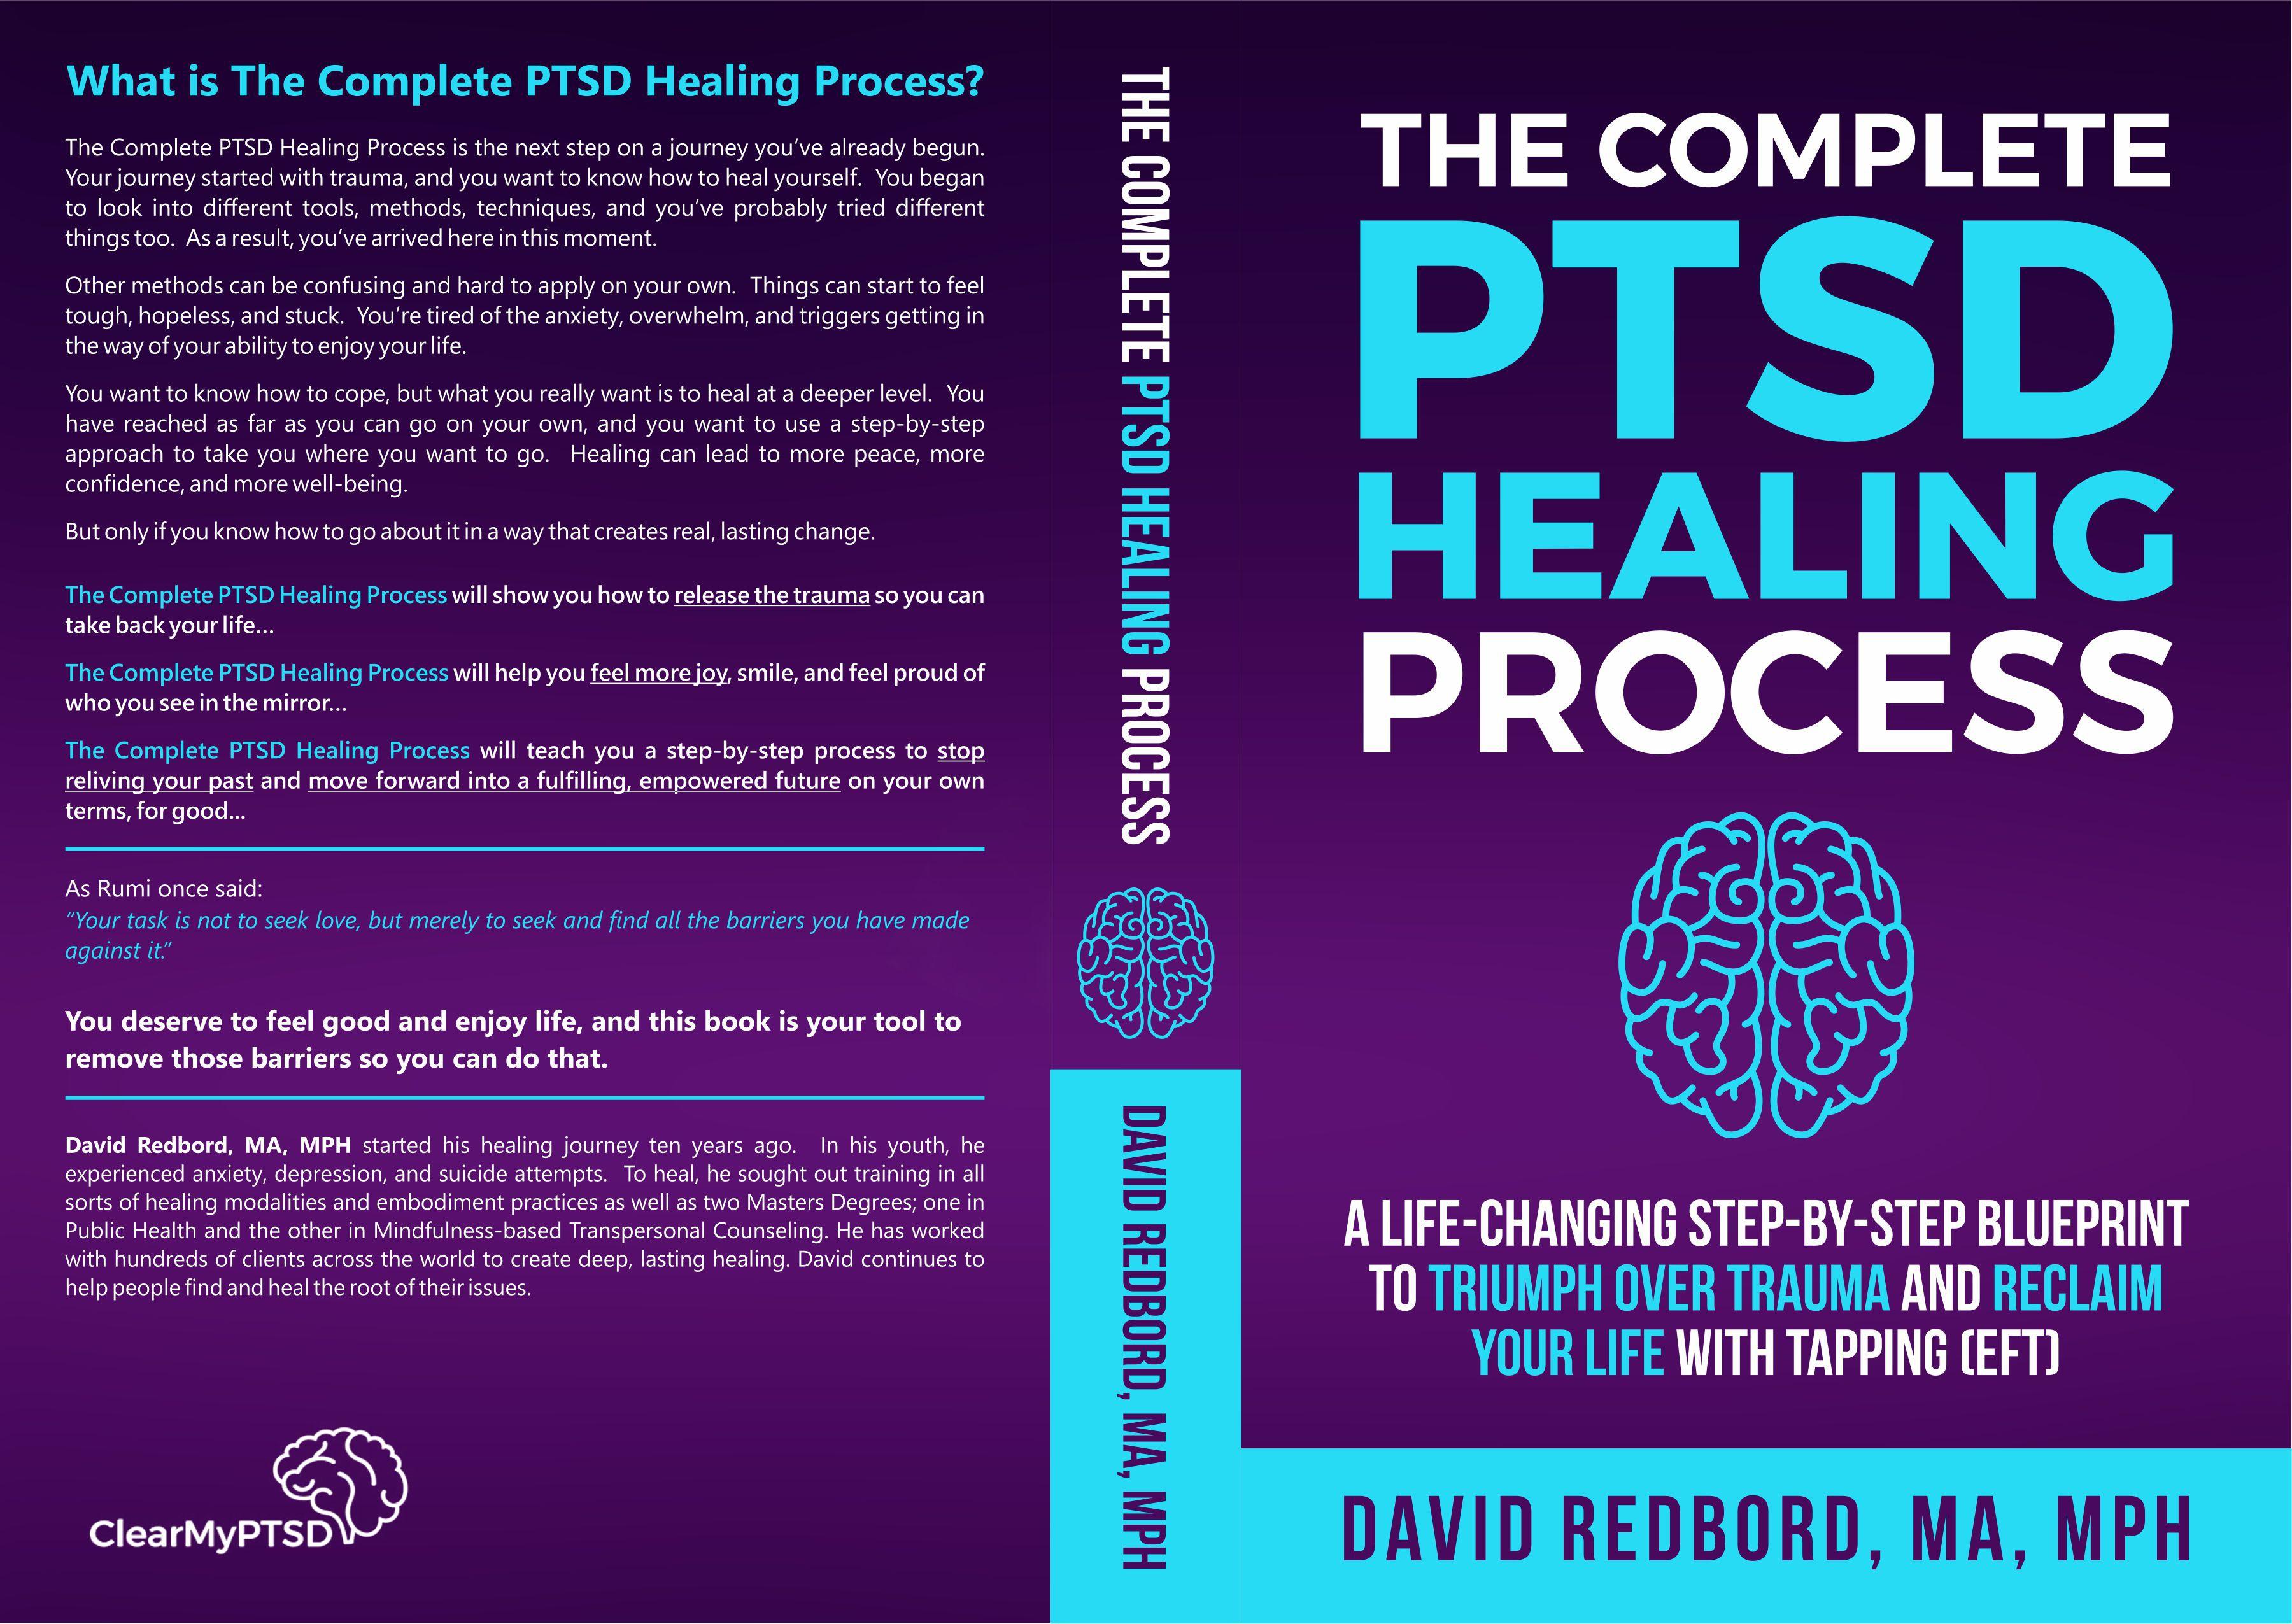 Maximum Creativity for Trauma Healing Book Cover - 1st in Series